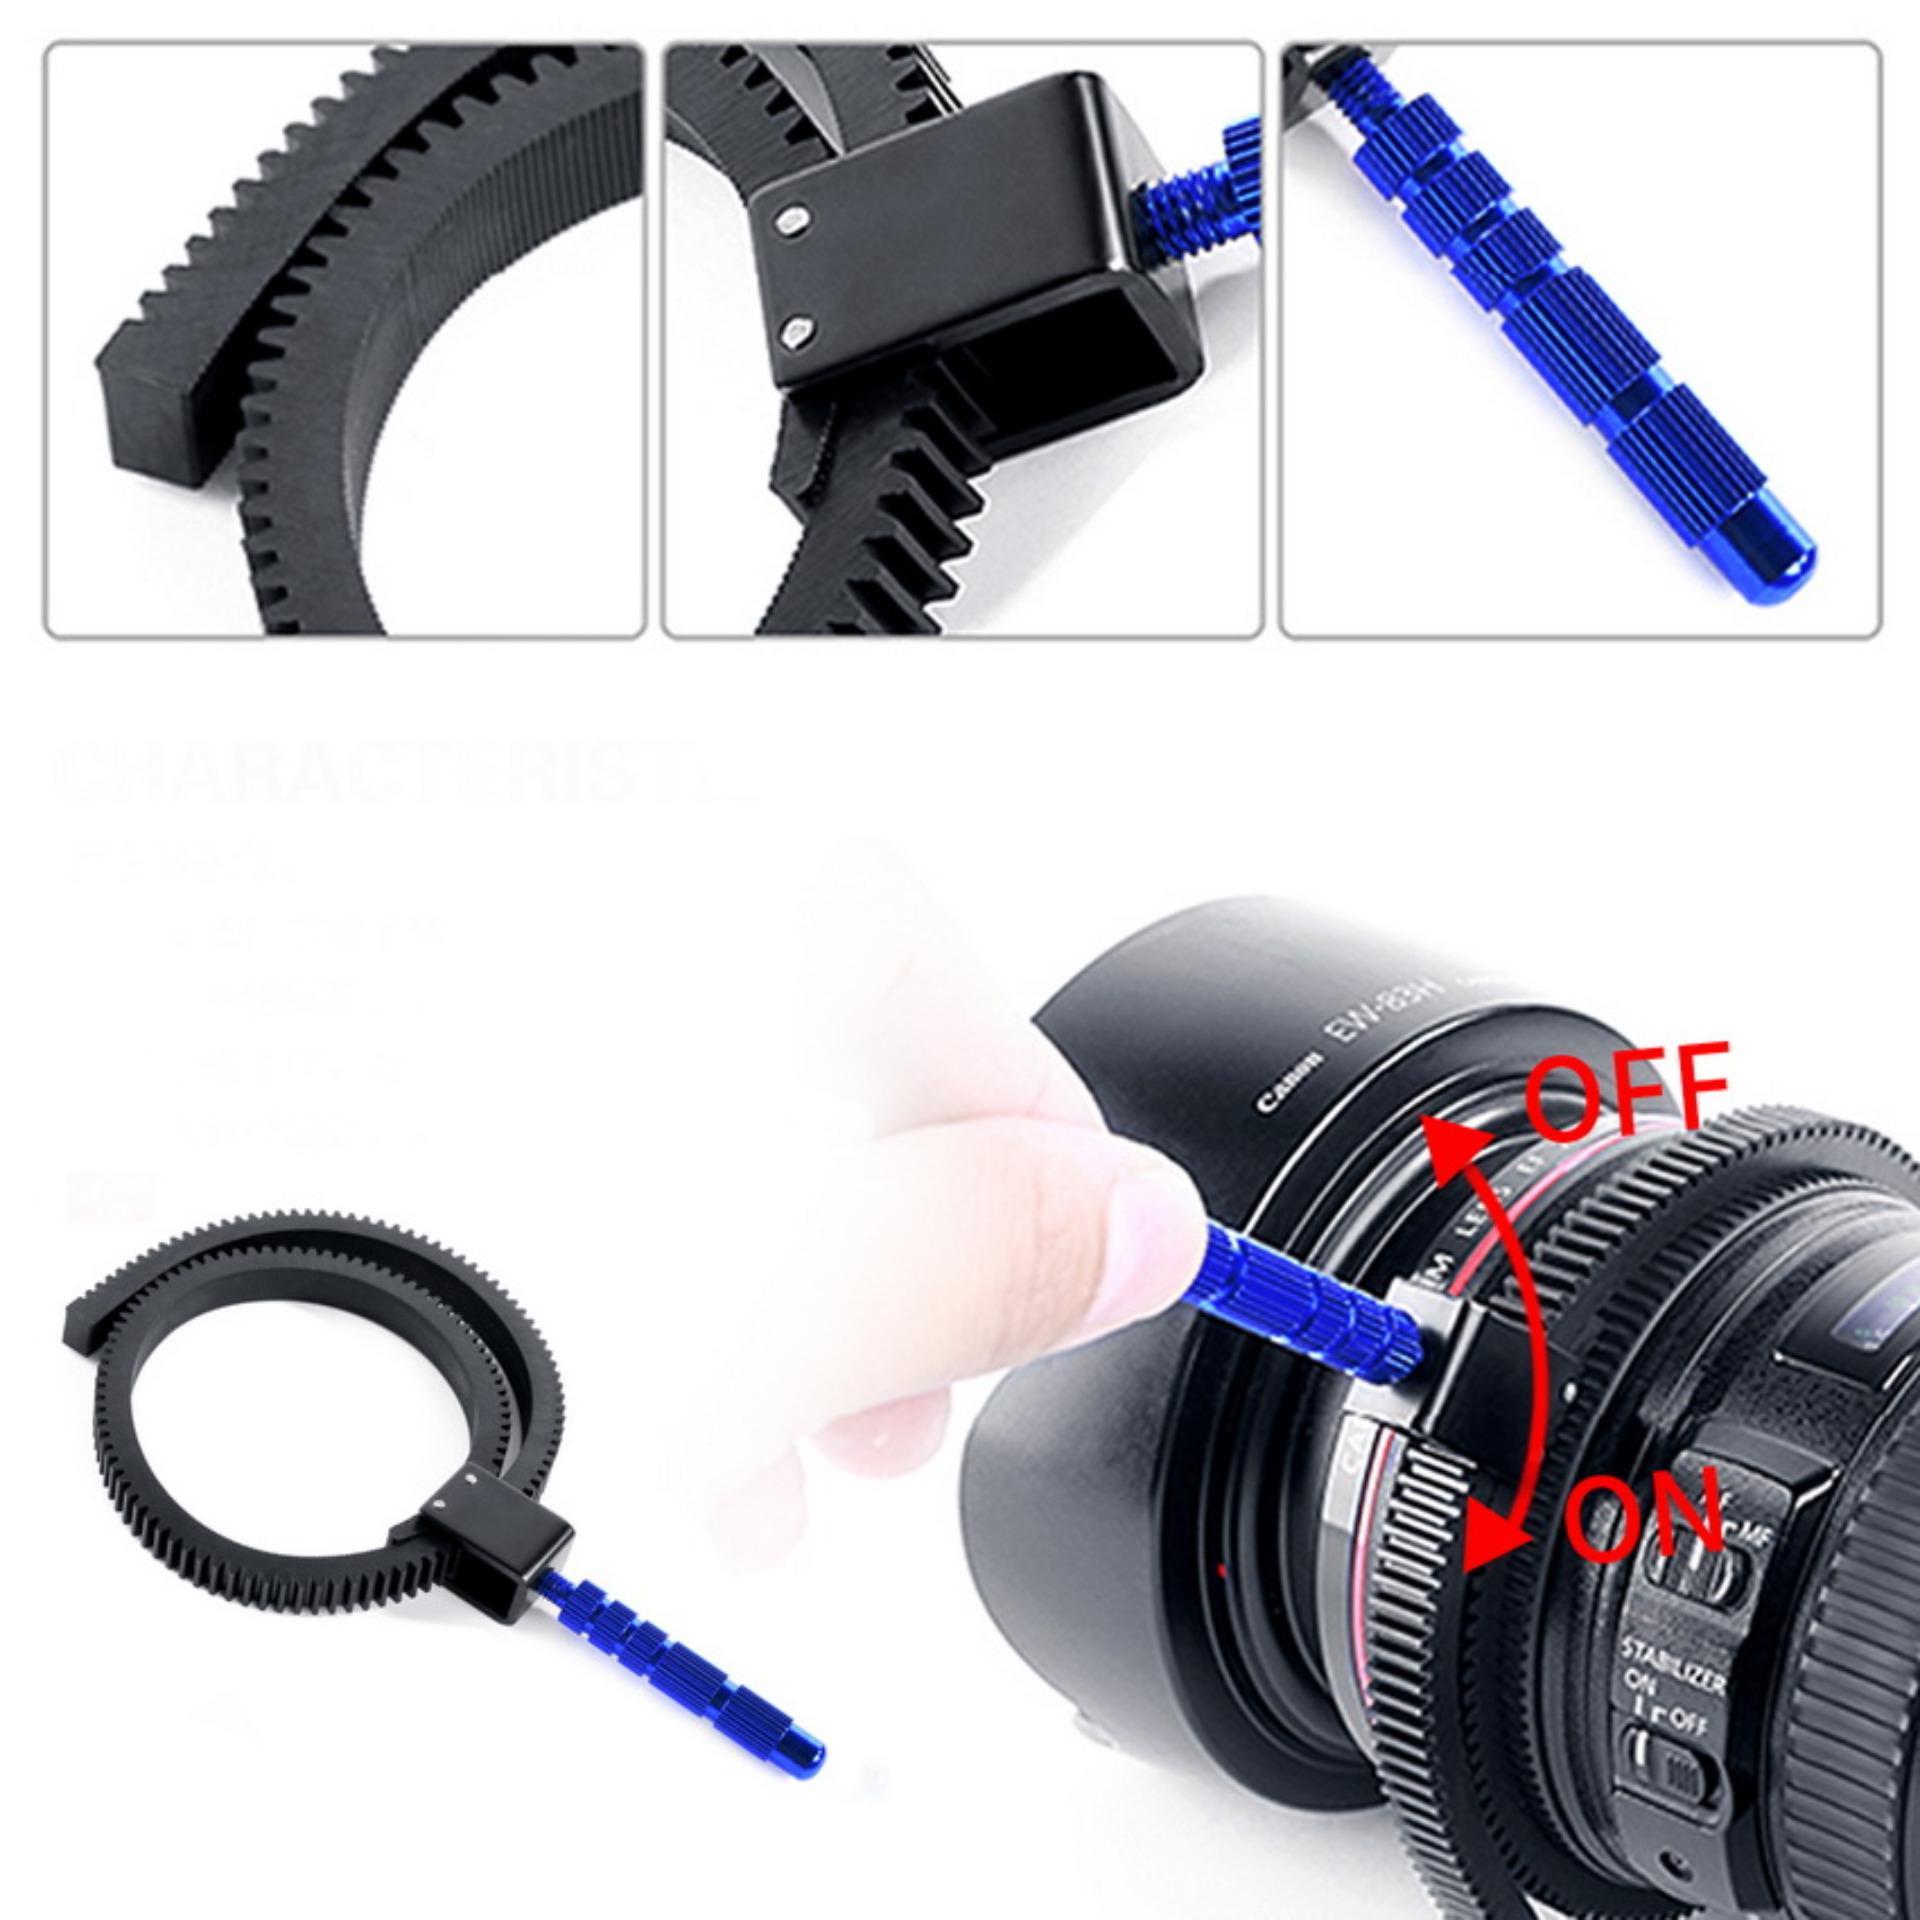 Meking Adjustable Flexible Lens Gear Ring Belt For Follow Focus Dslr Camcorder Canon By Mkstudio.